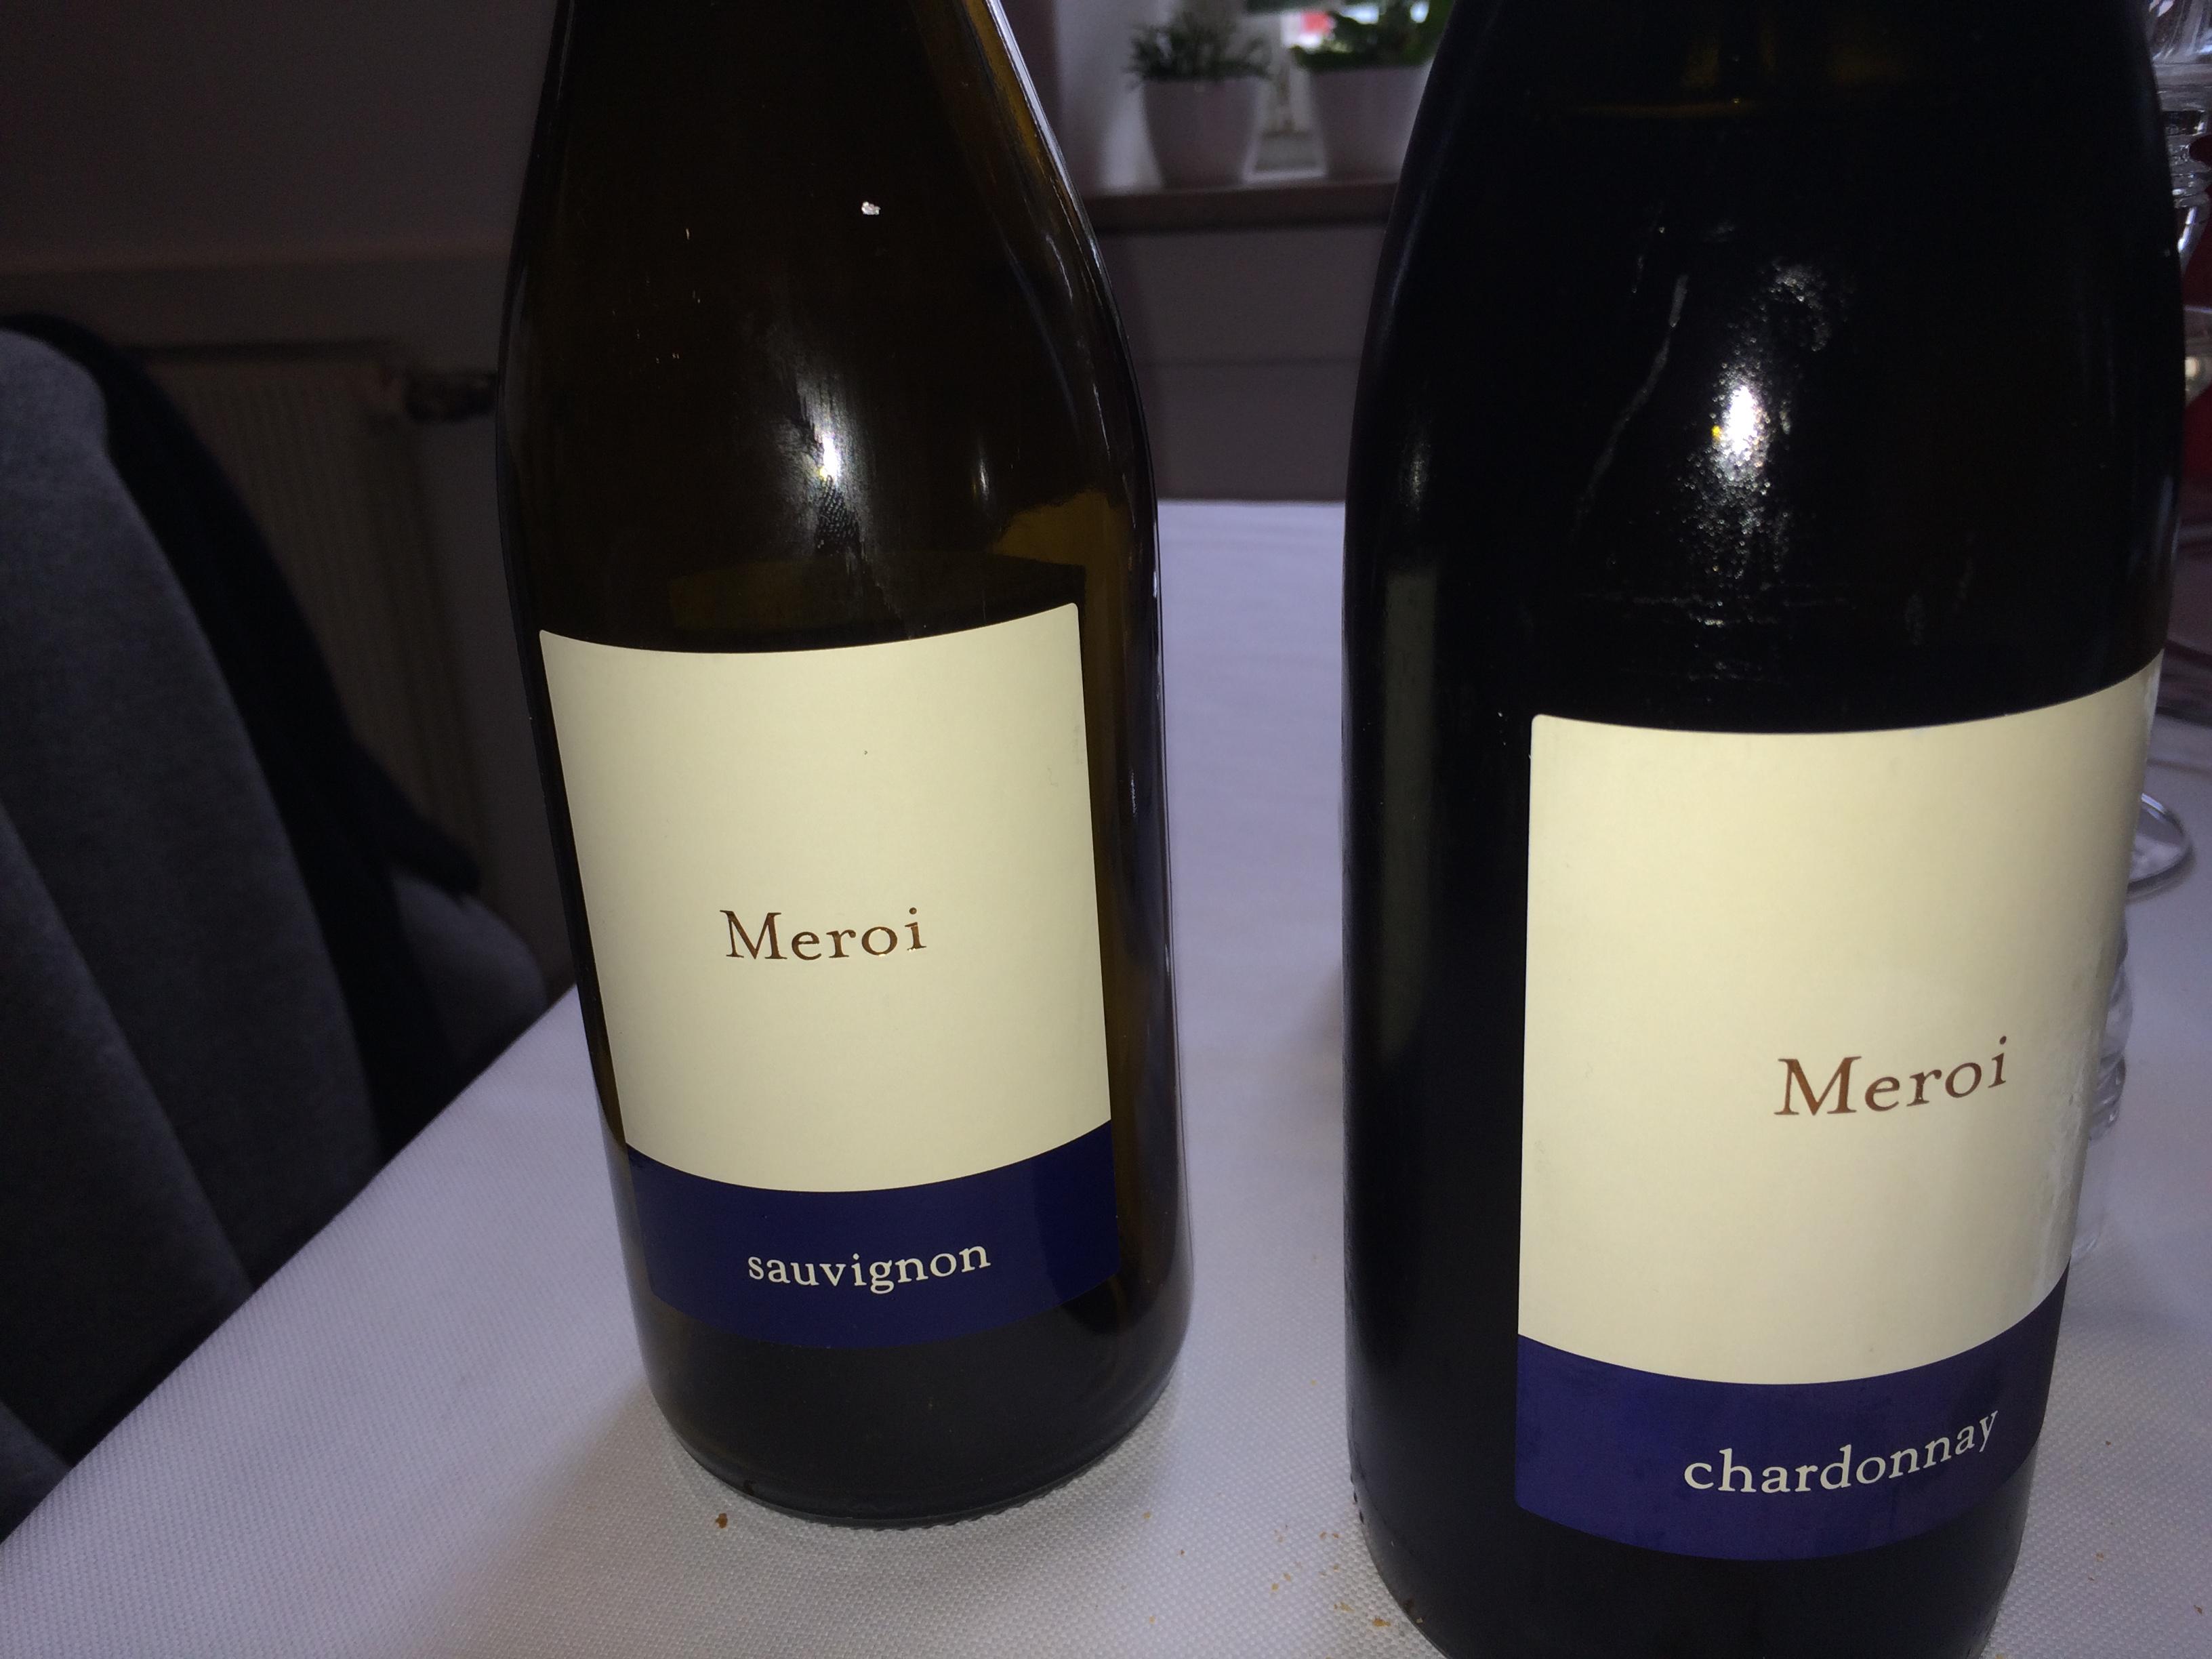 Sauvignon & Chardonnay